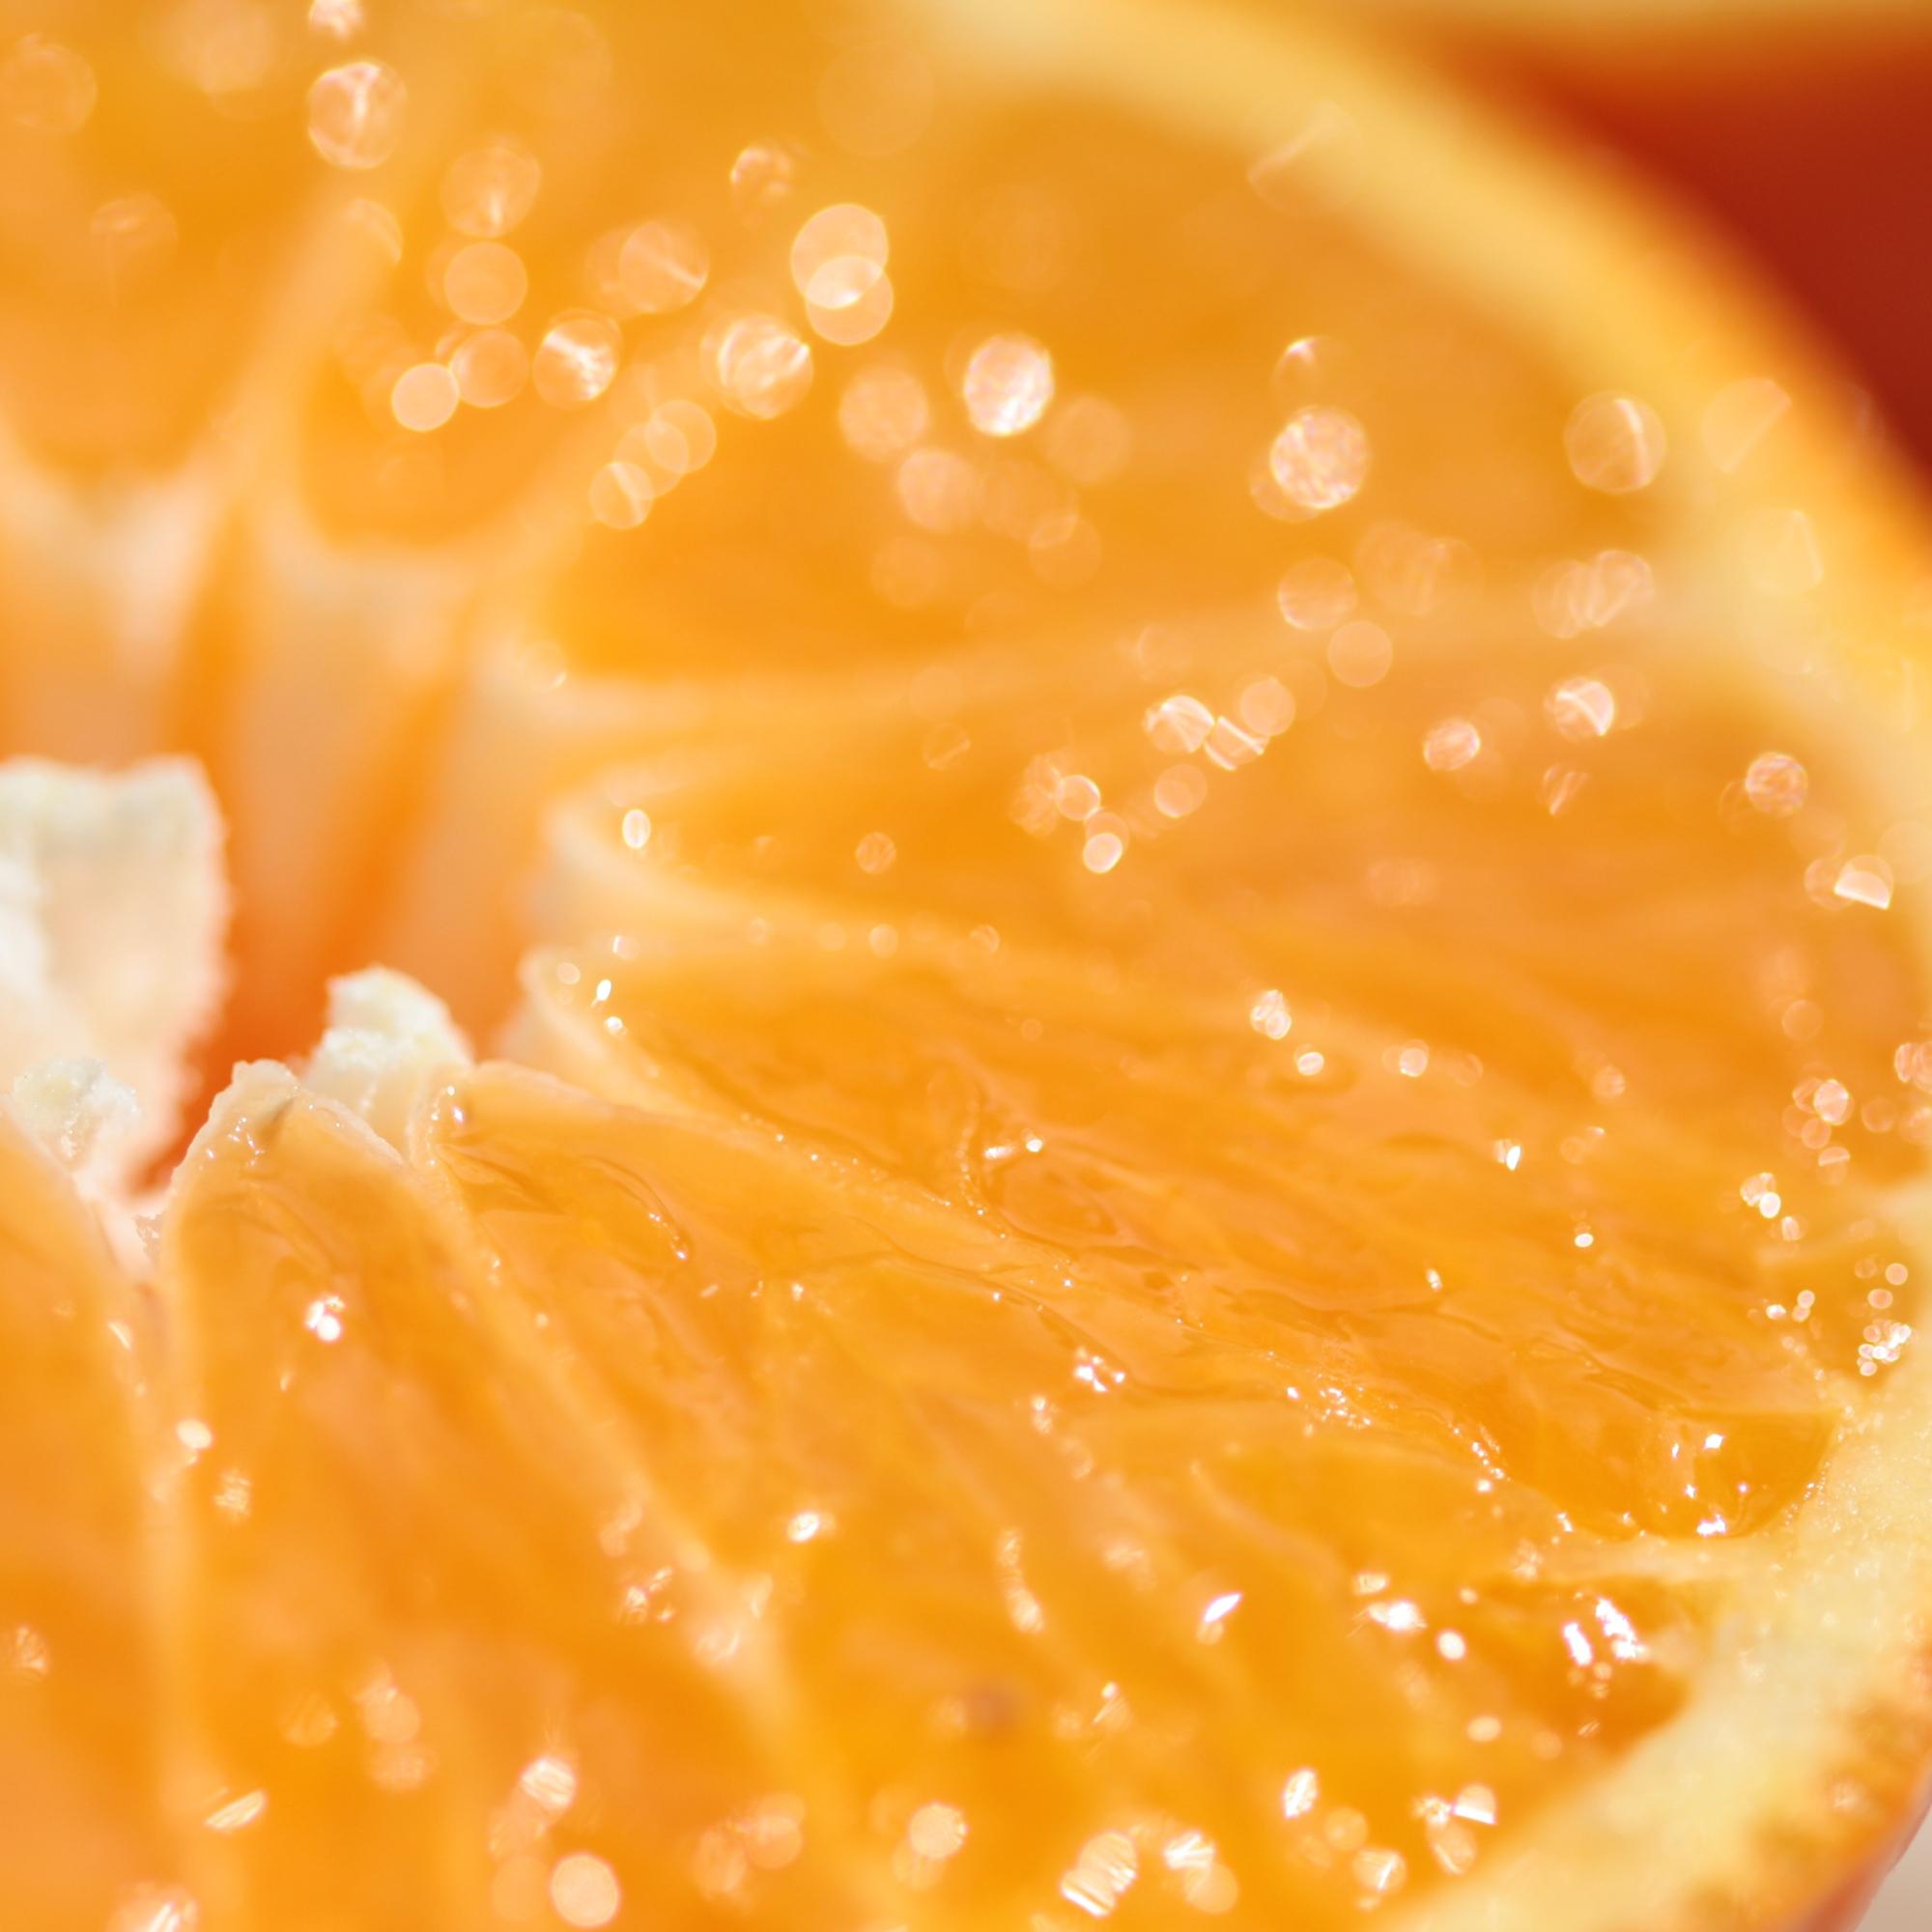 Sparkly Orange